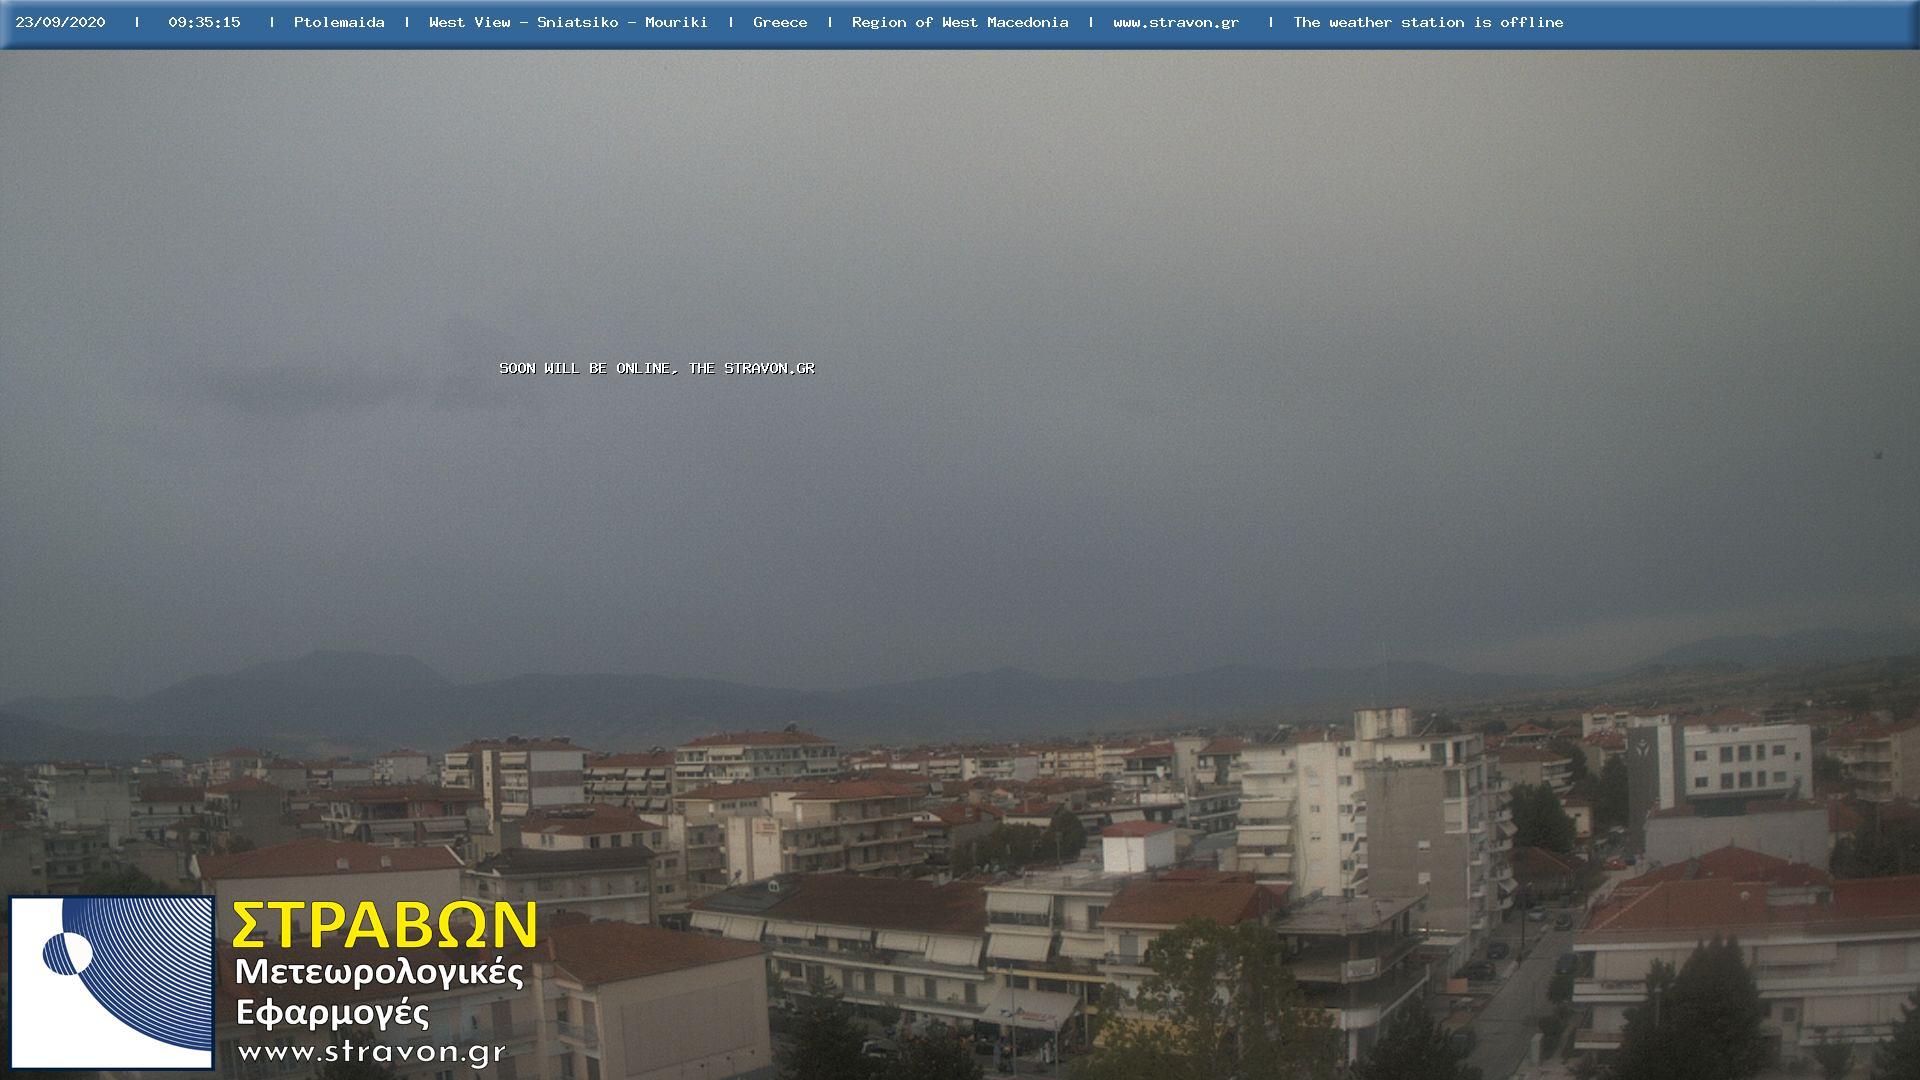 Webcam Πτολεμαΐδα